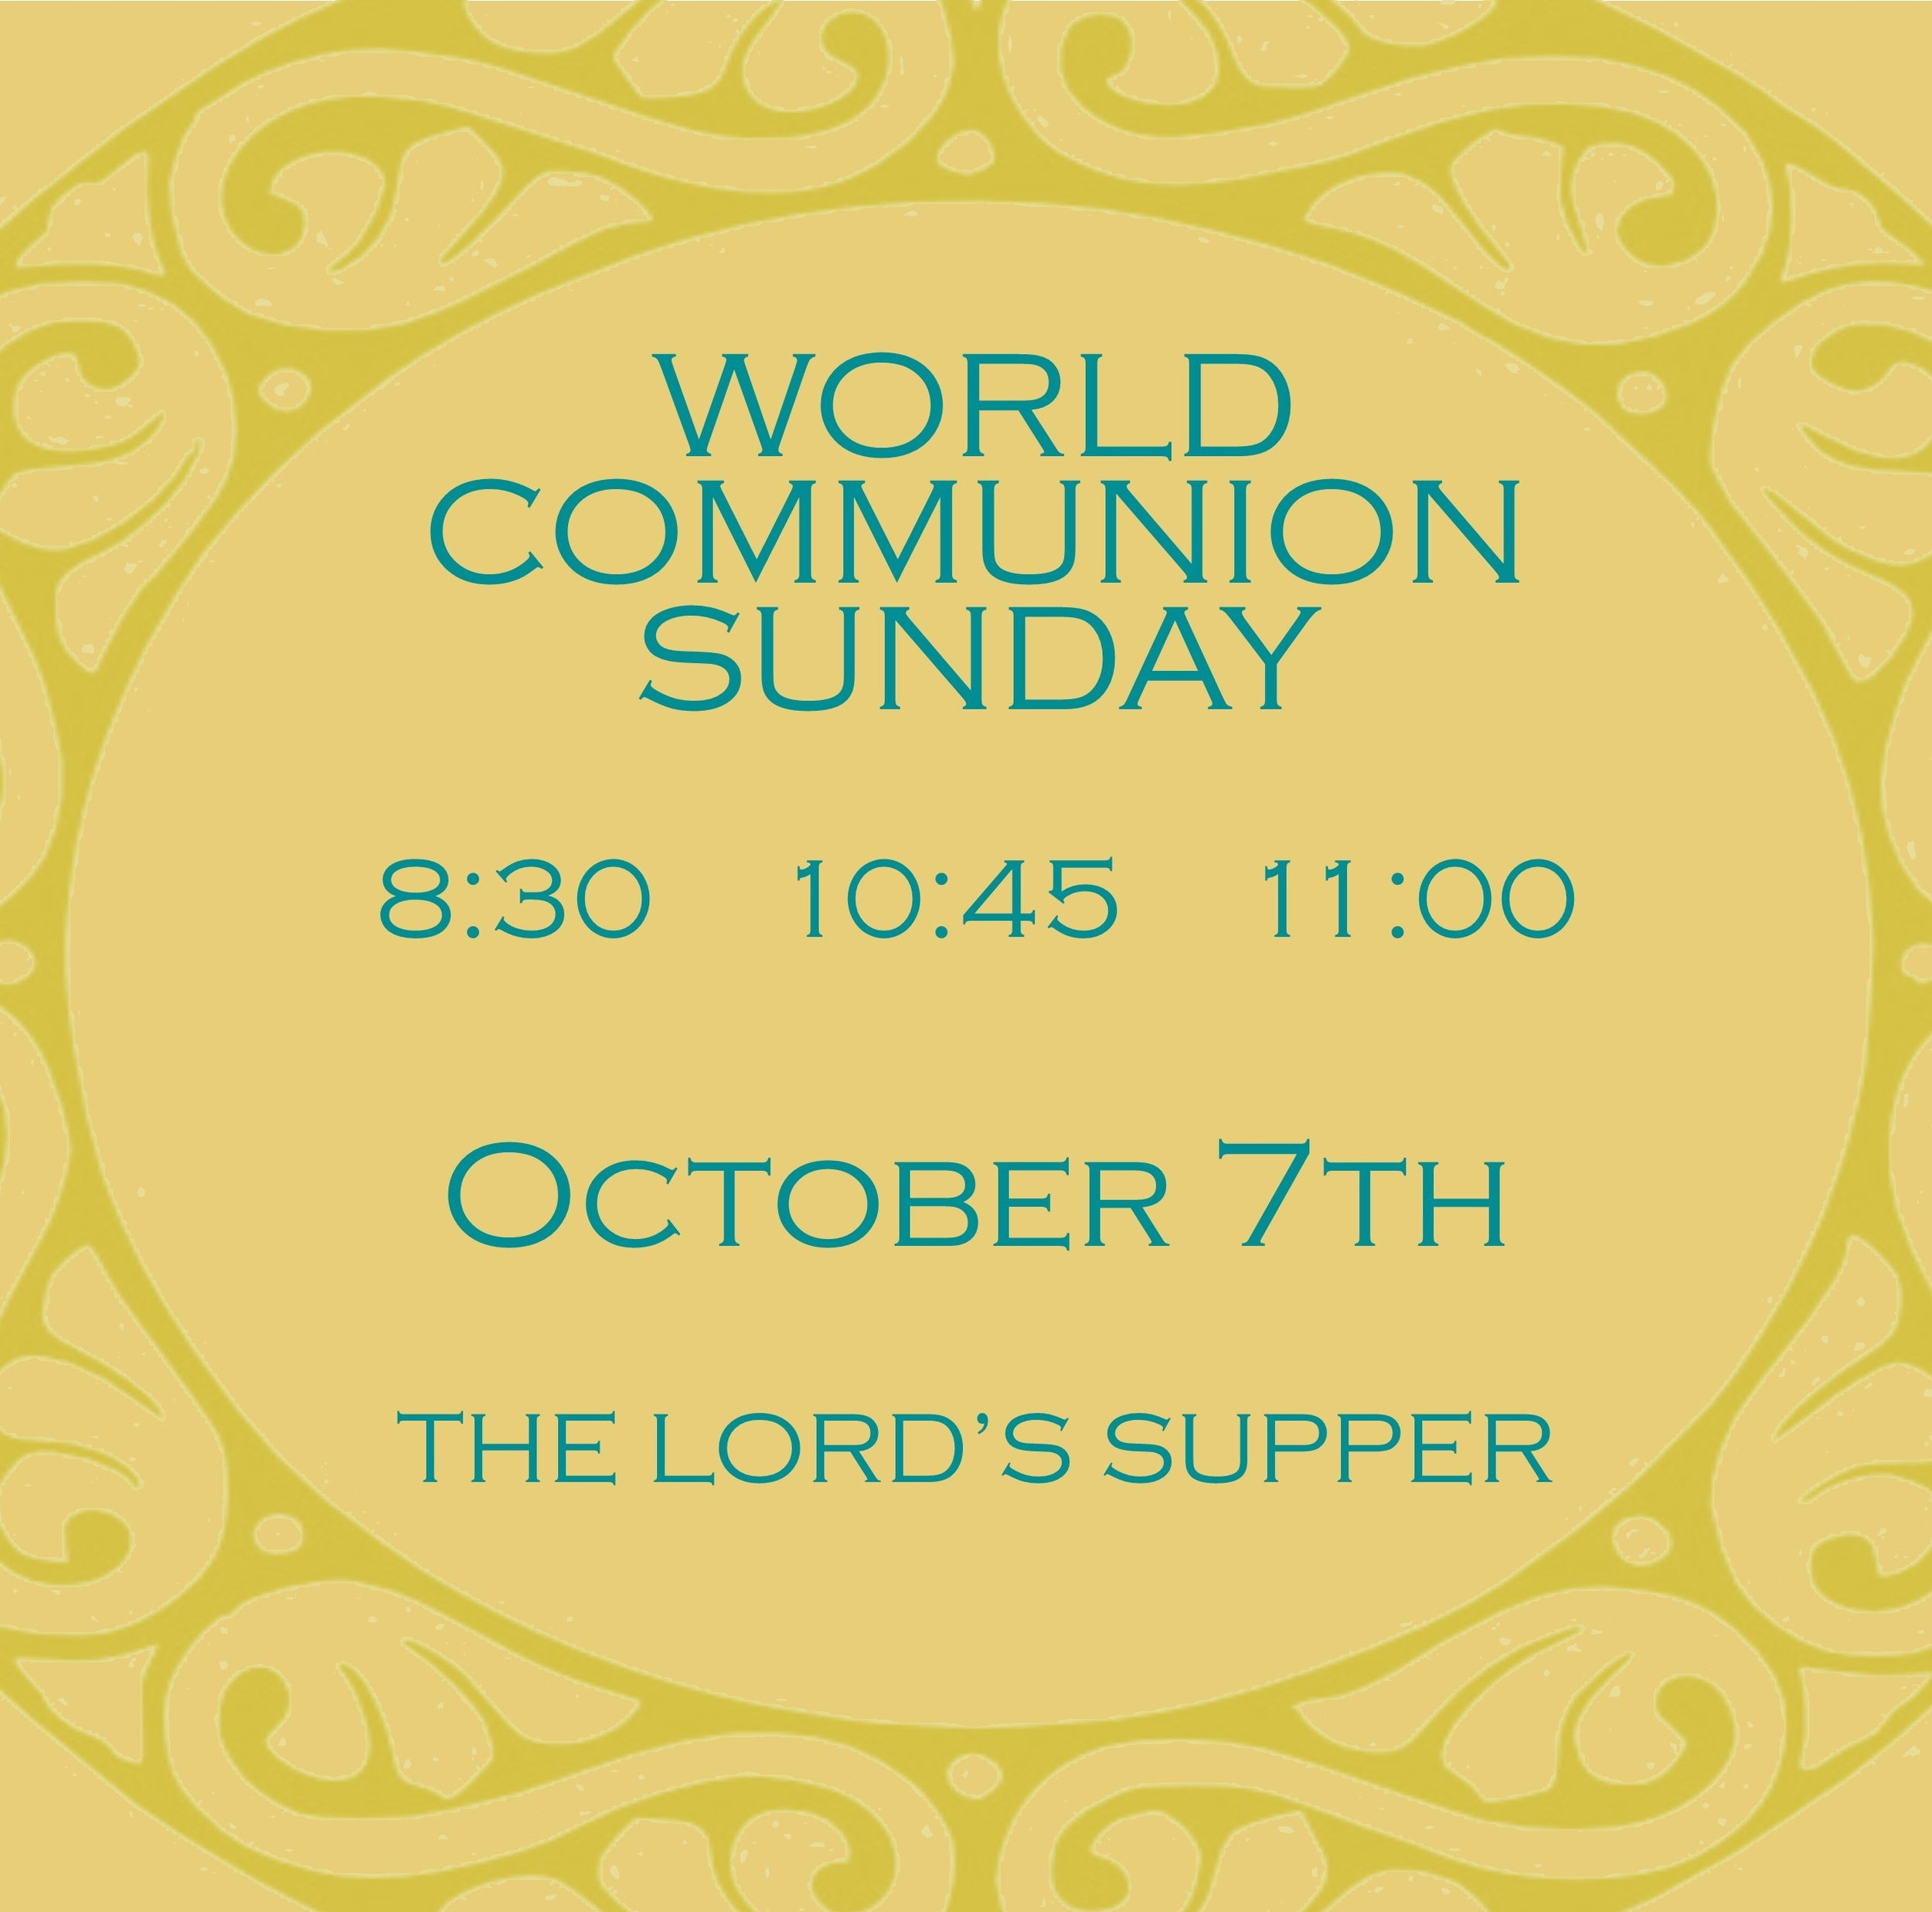 World Communion Sunday insta 092118.jpg